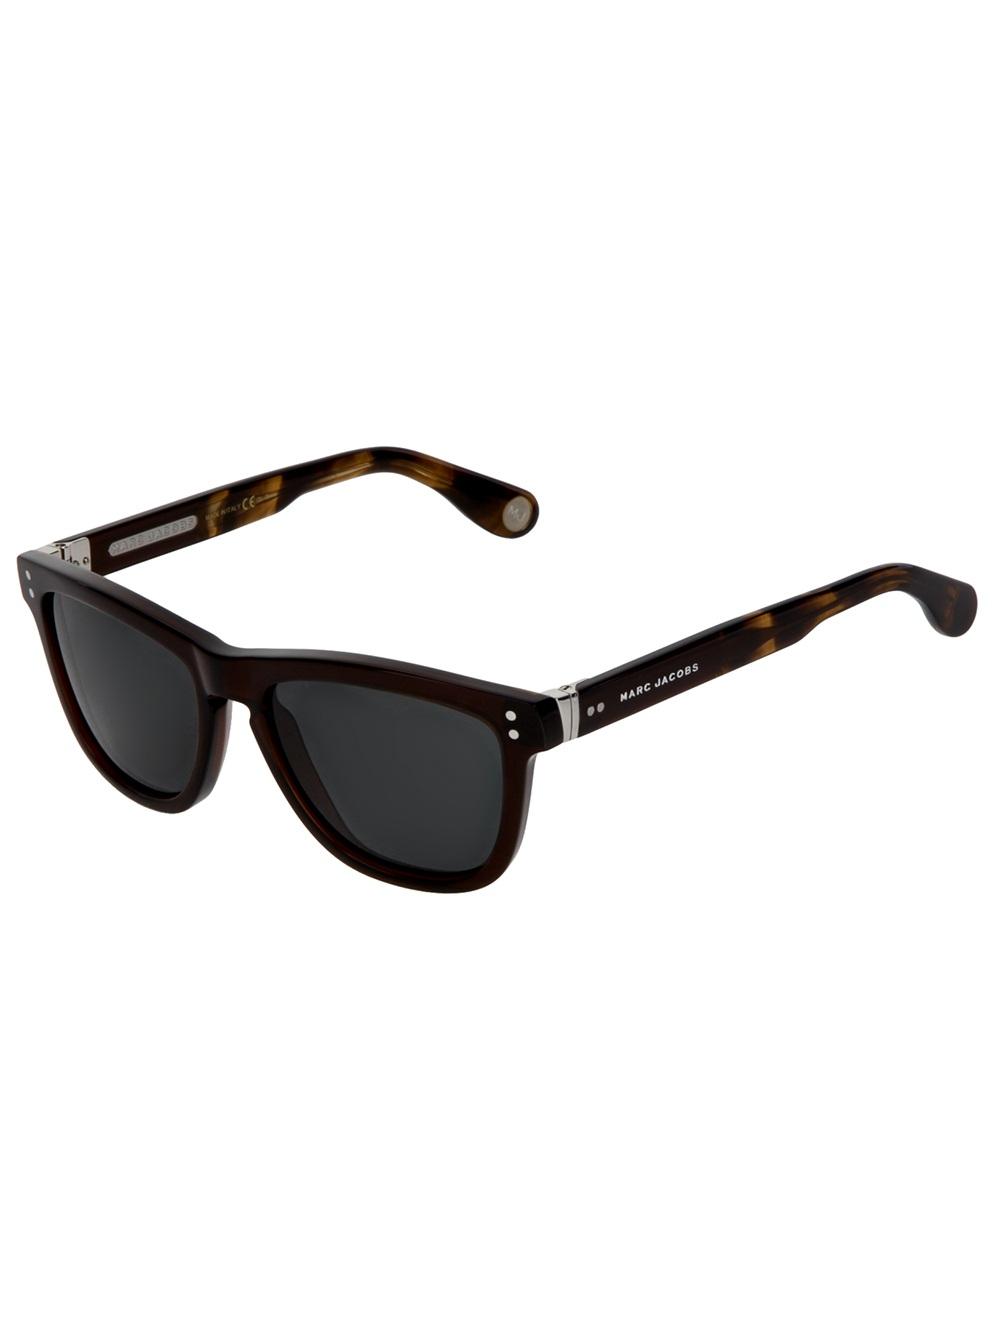 Marc Jacobs Sunglasses Men  marc jacobs wayfarer sunglasses in black for men lyst